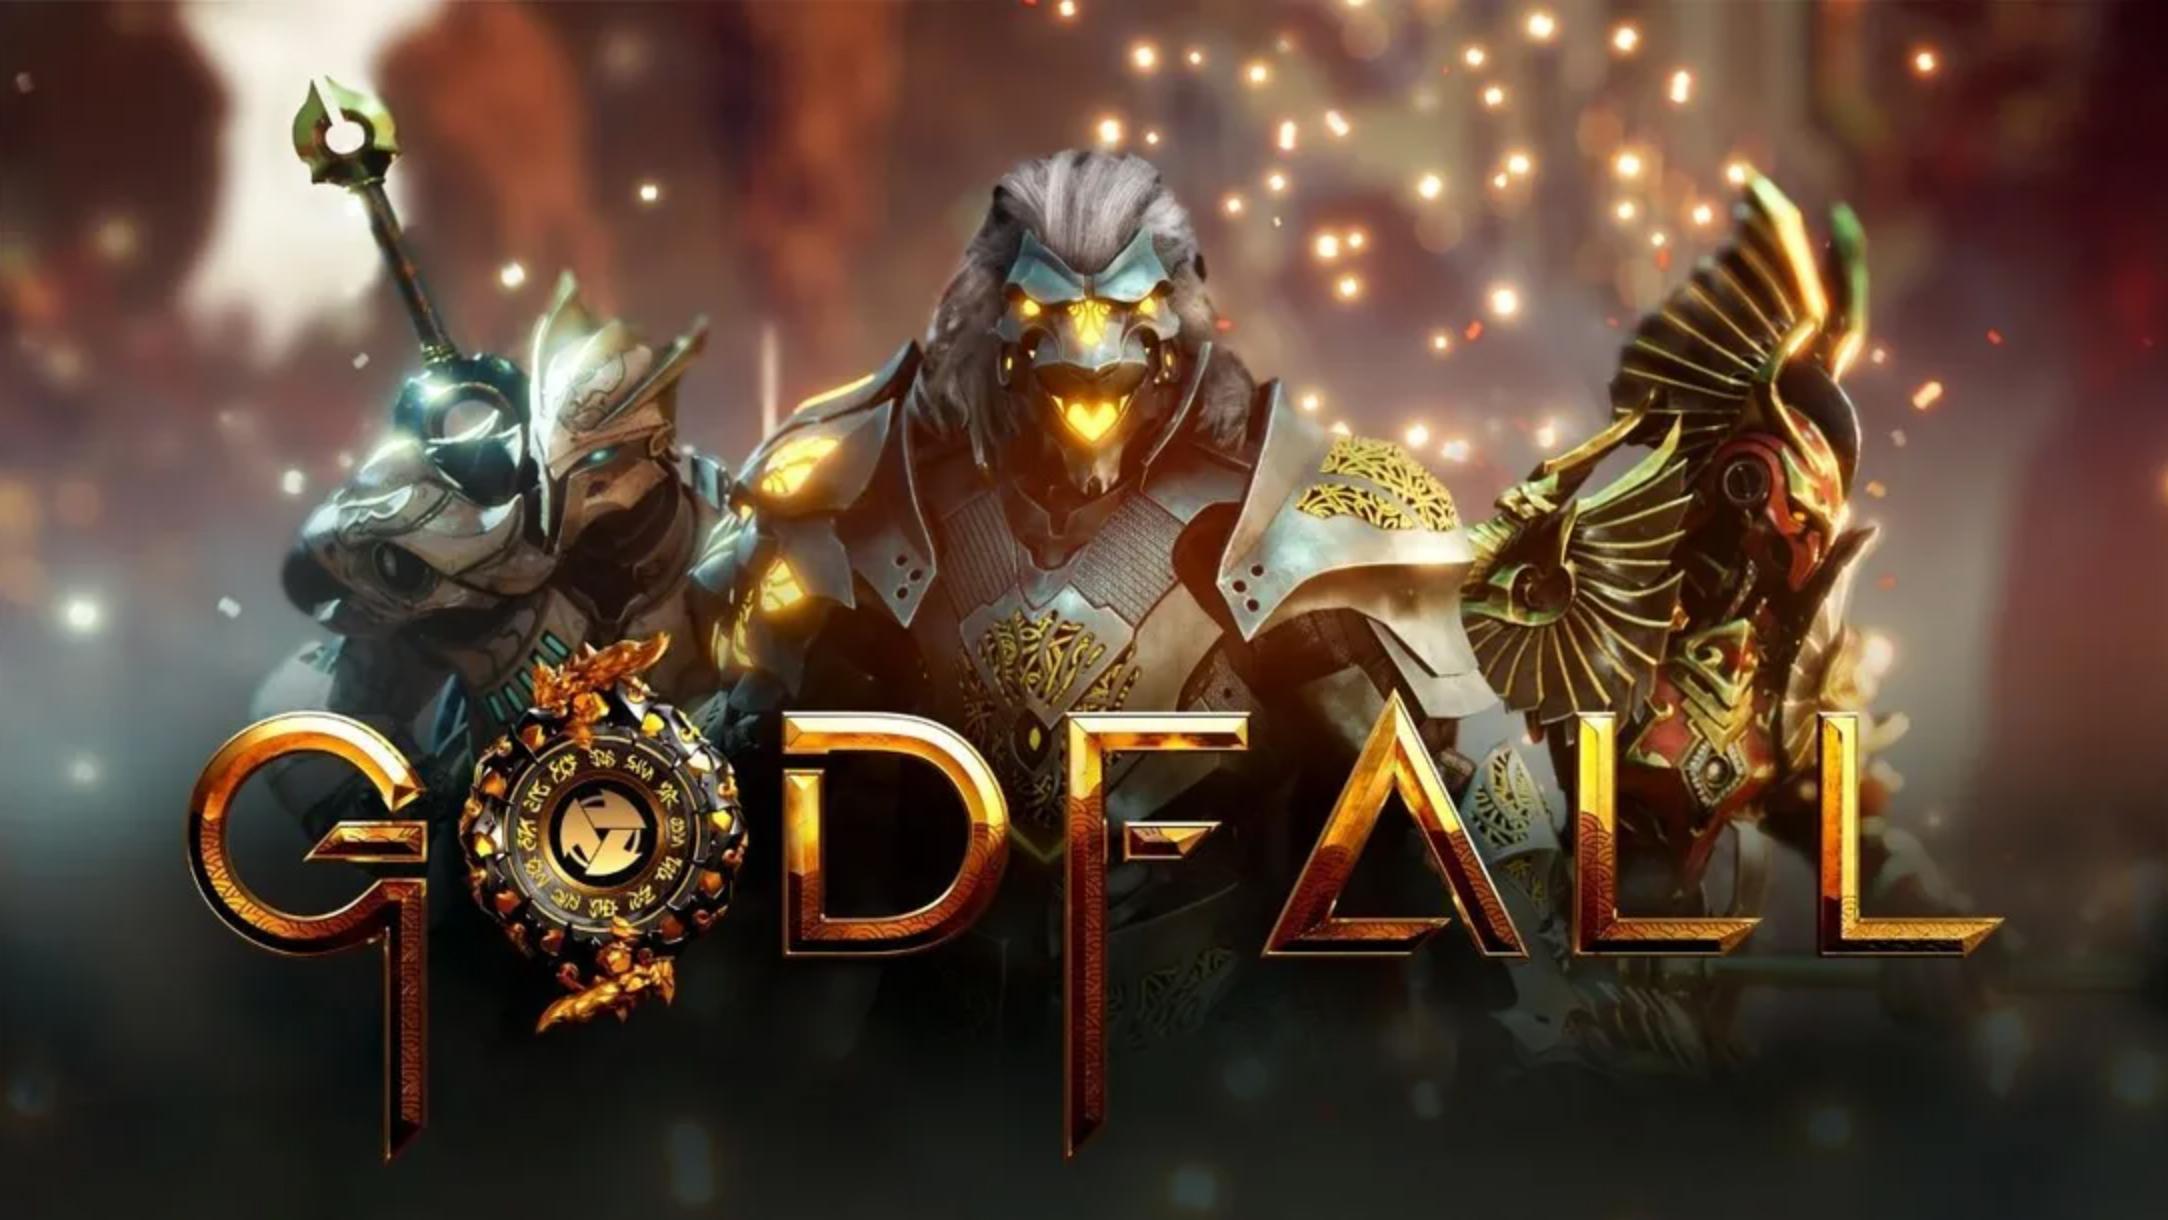 godfall video game